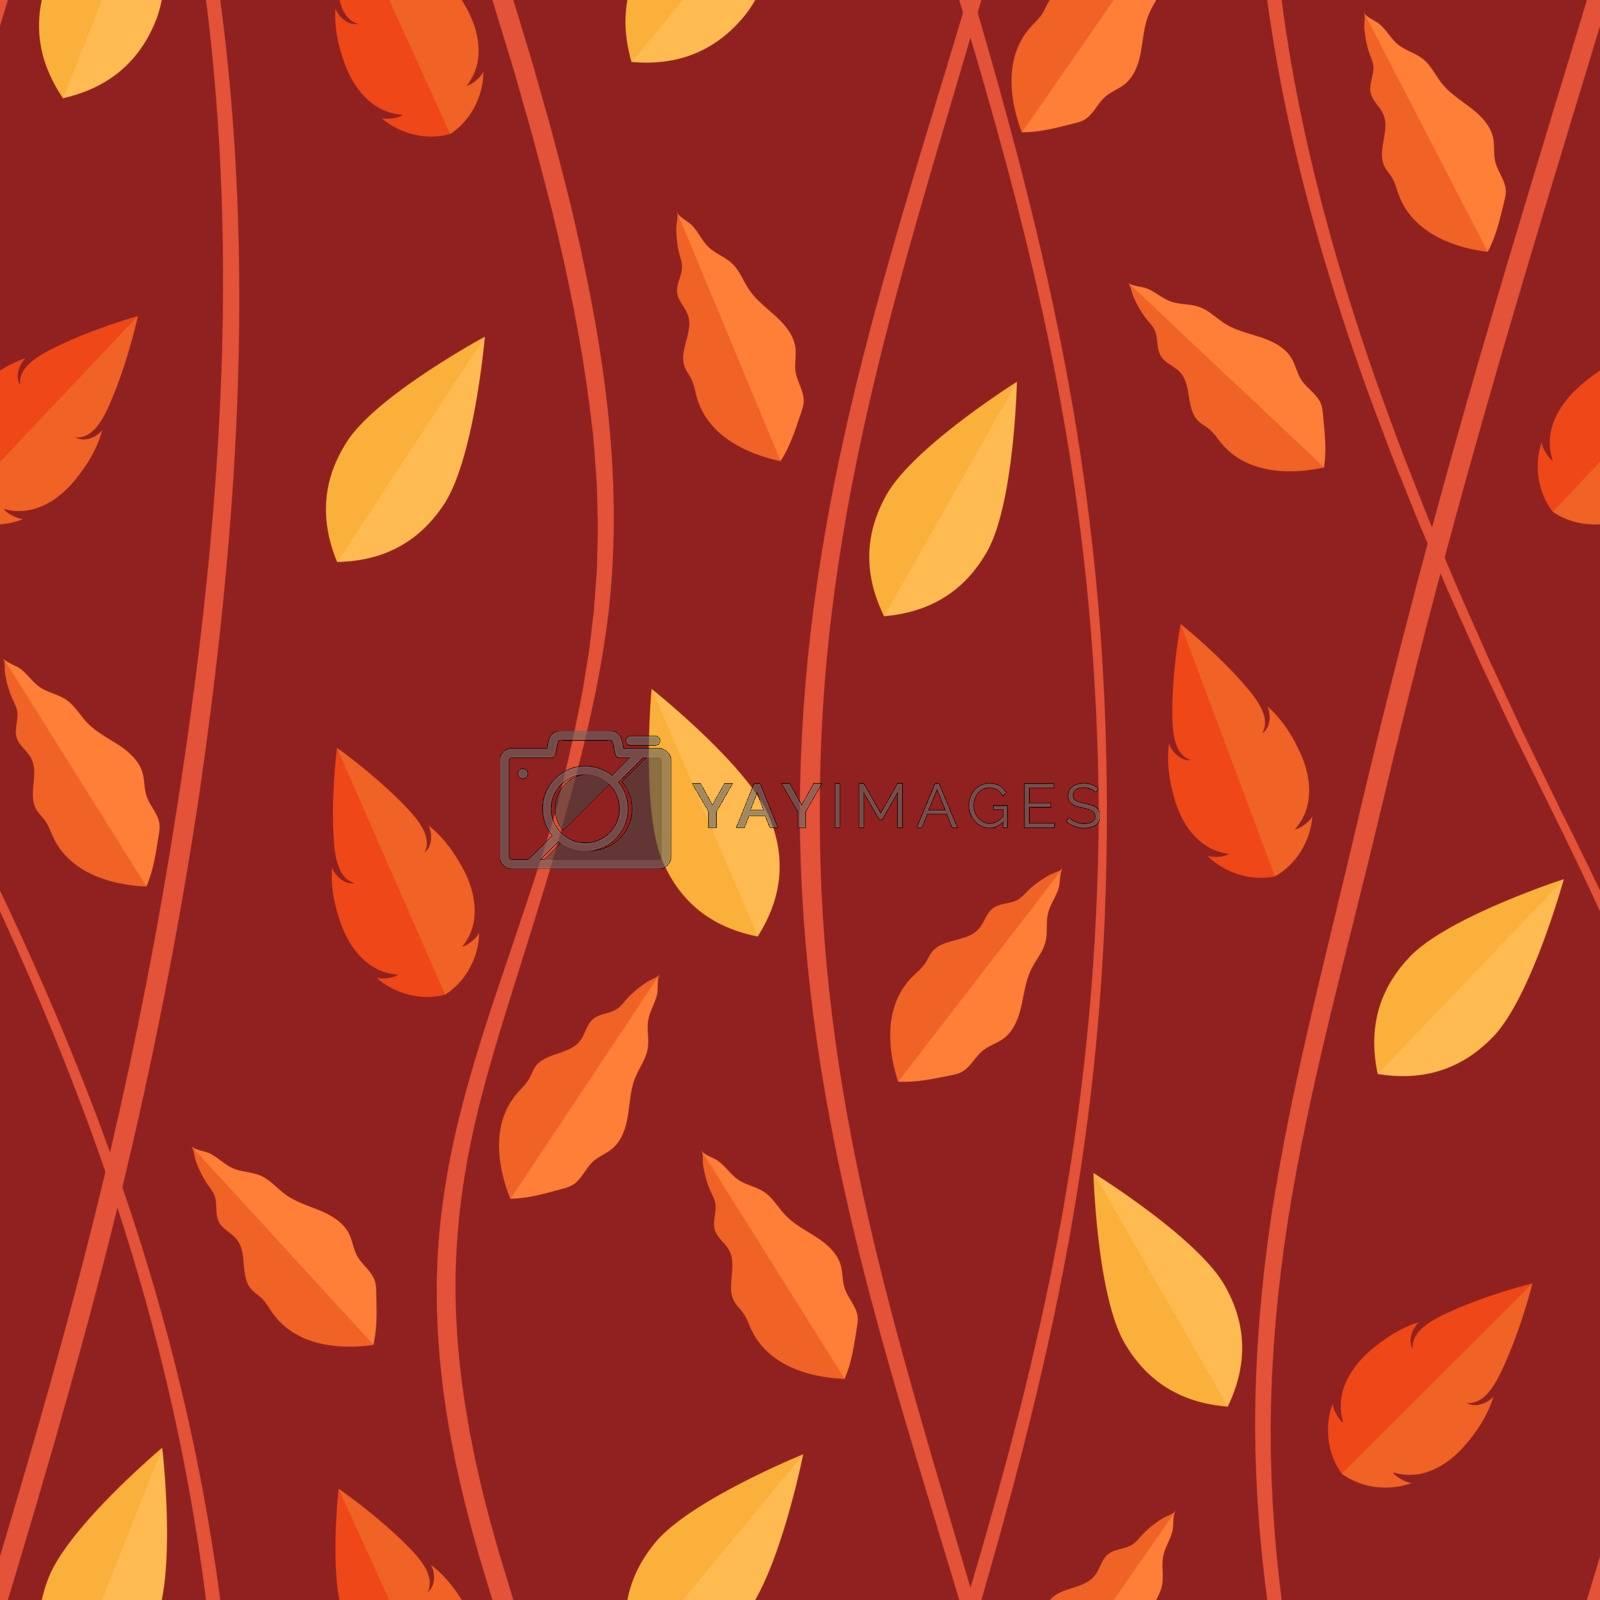 Orange leaves pattern on seamless background